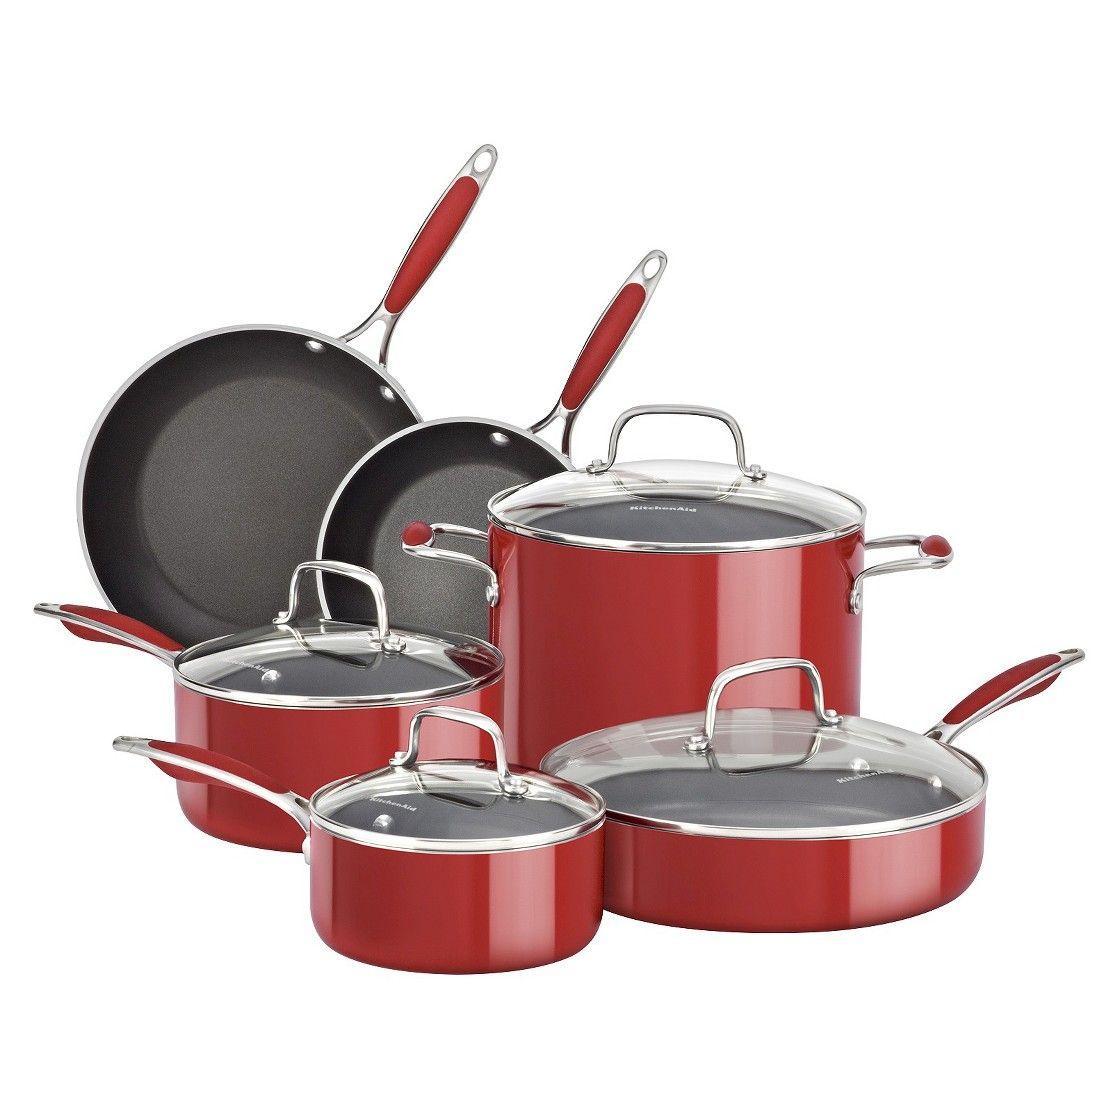 Kitchenaid 10 piece aluminum cookware set red cookware